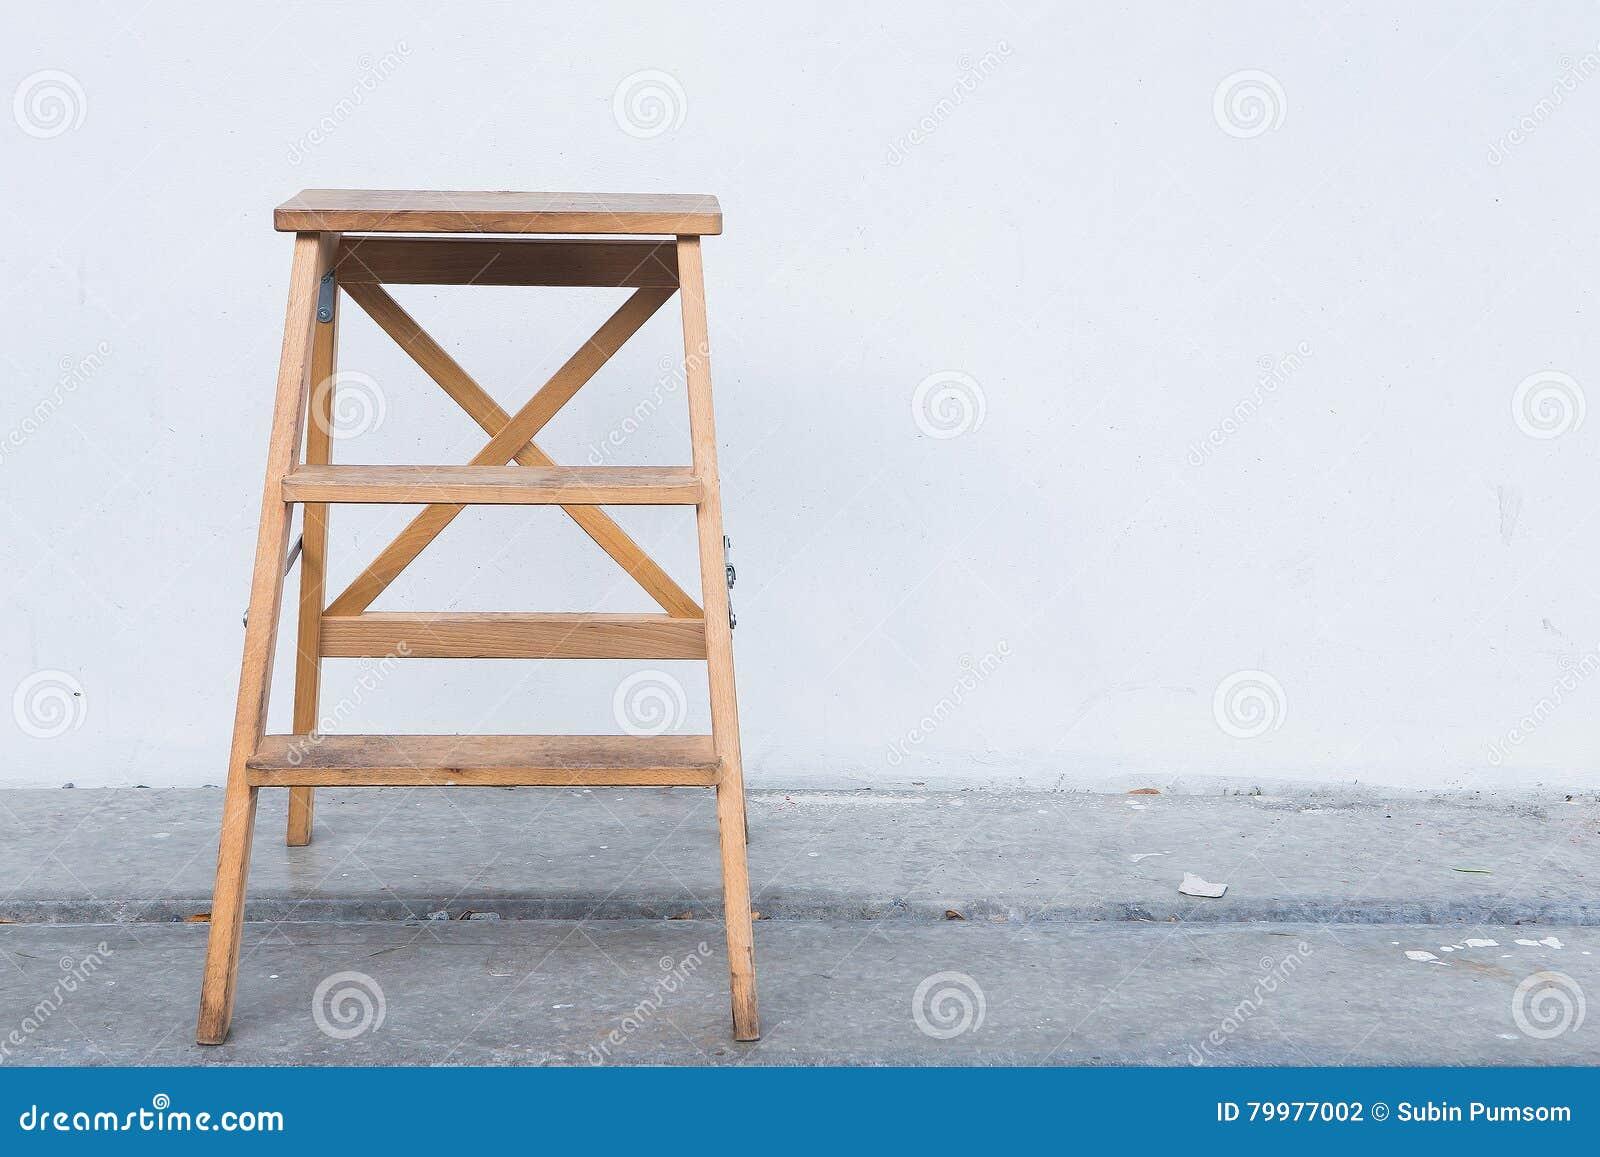 Houten ladder op witte muur met uitstekende houten vloer